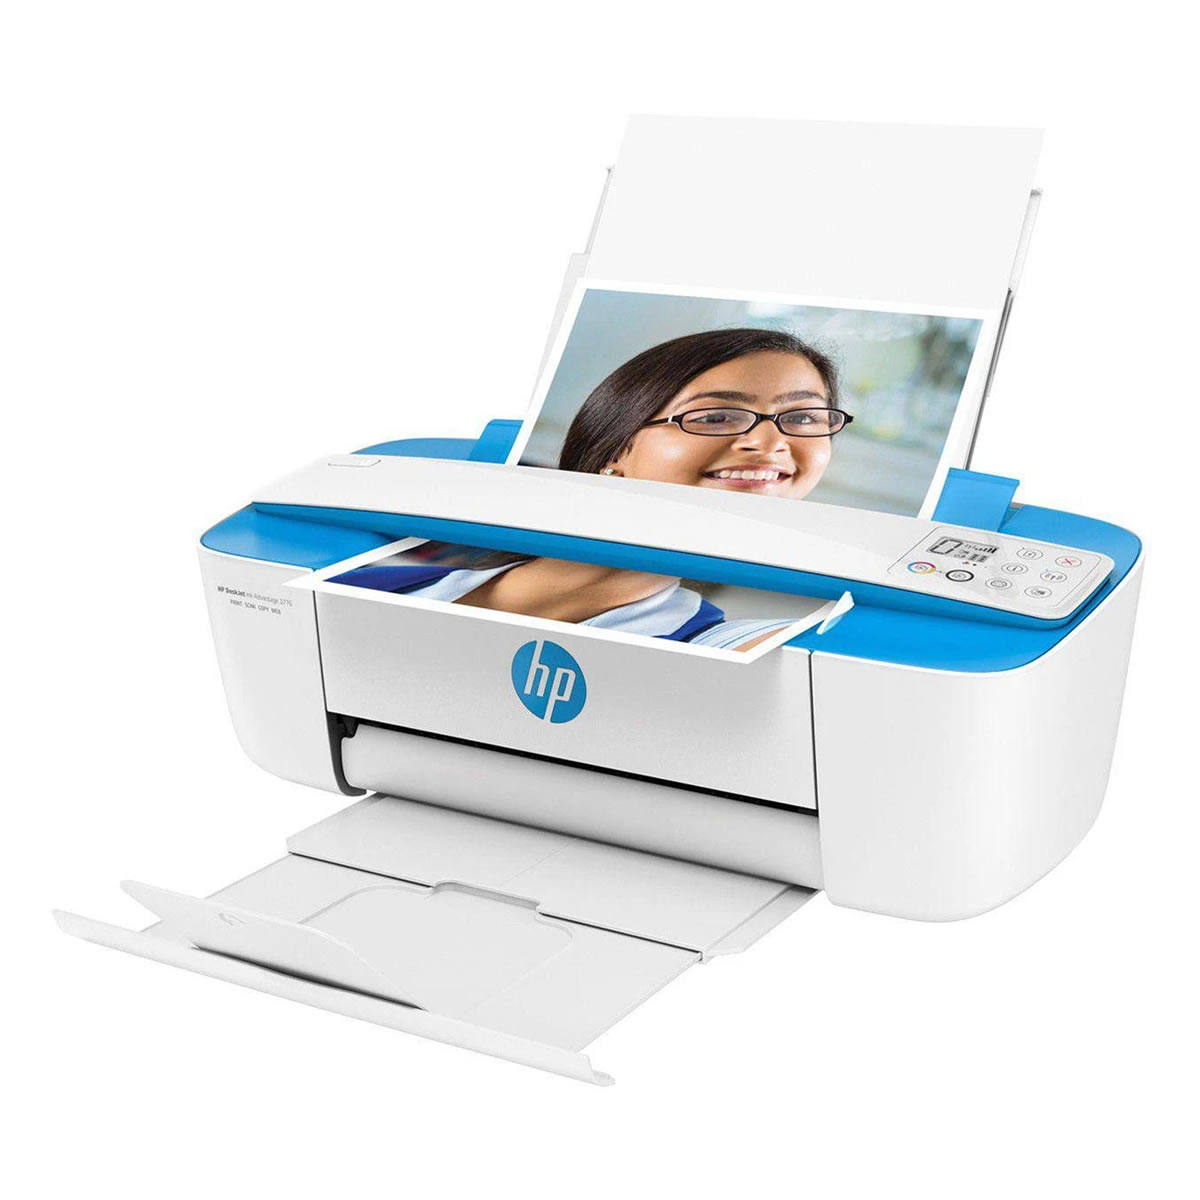 Impressora Multifuncional HP Deskjet Ink Advantage 3776 J9V88A Jato de Tinta Colorida com Wireless e USB